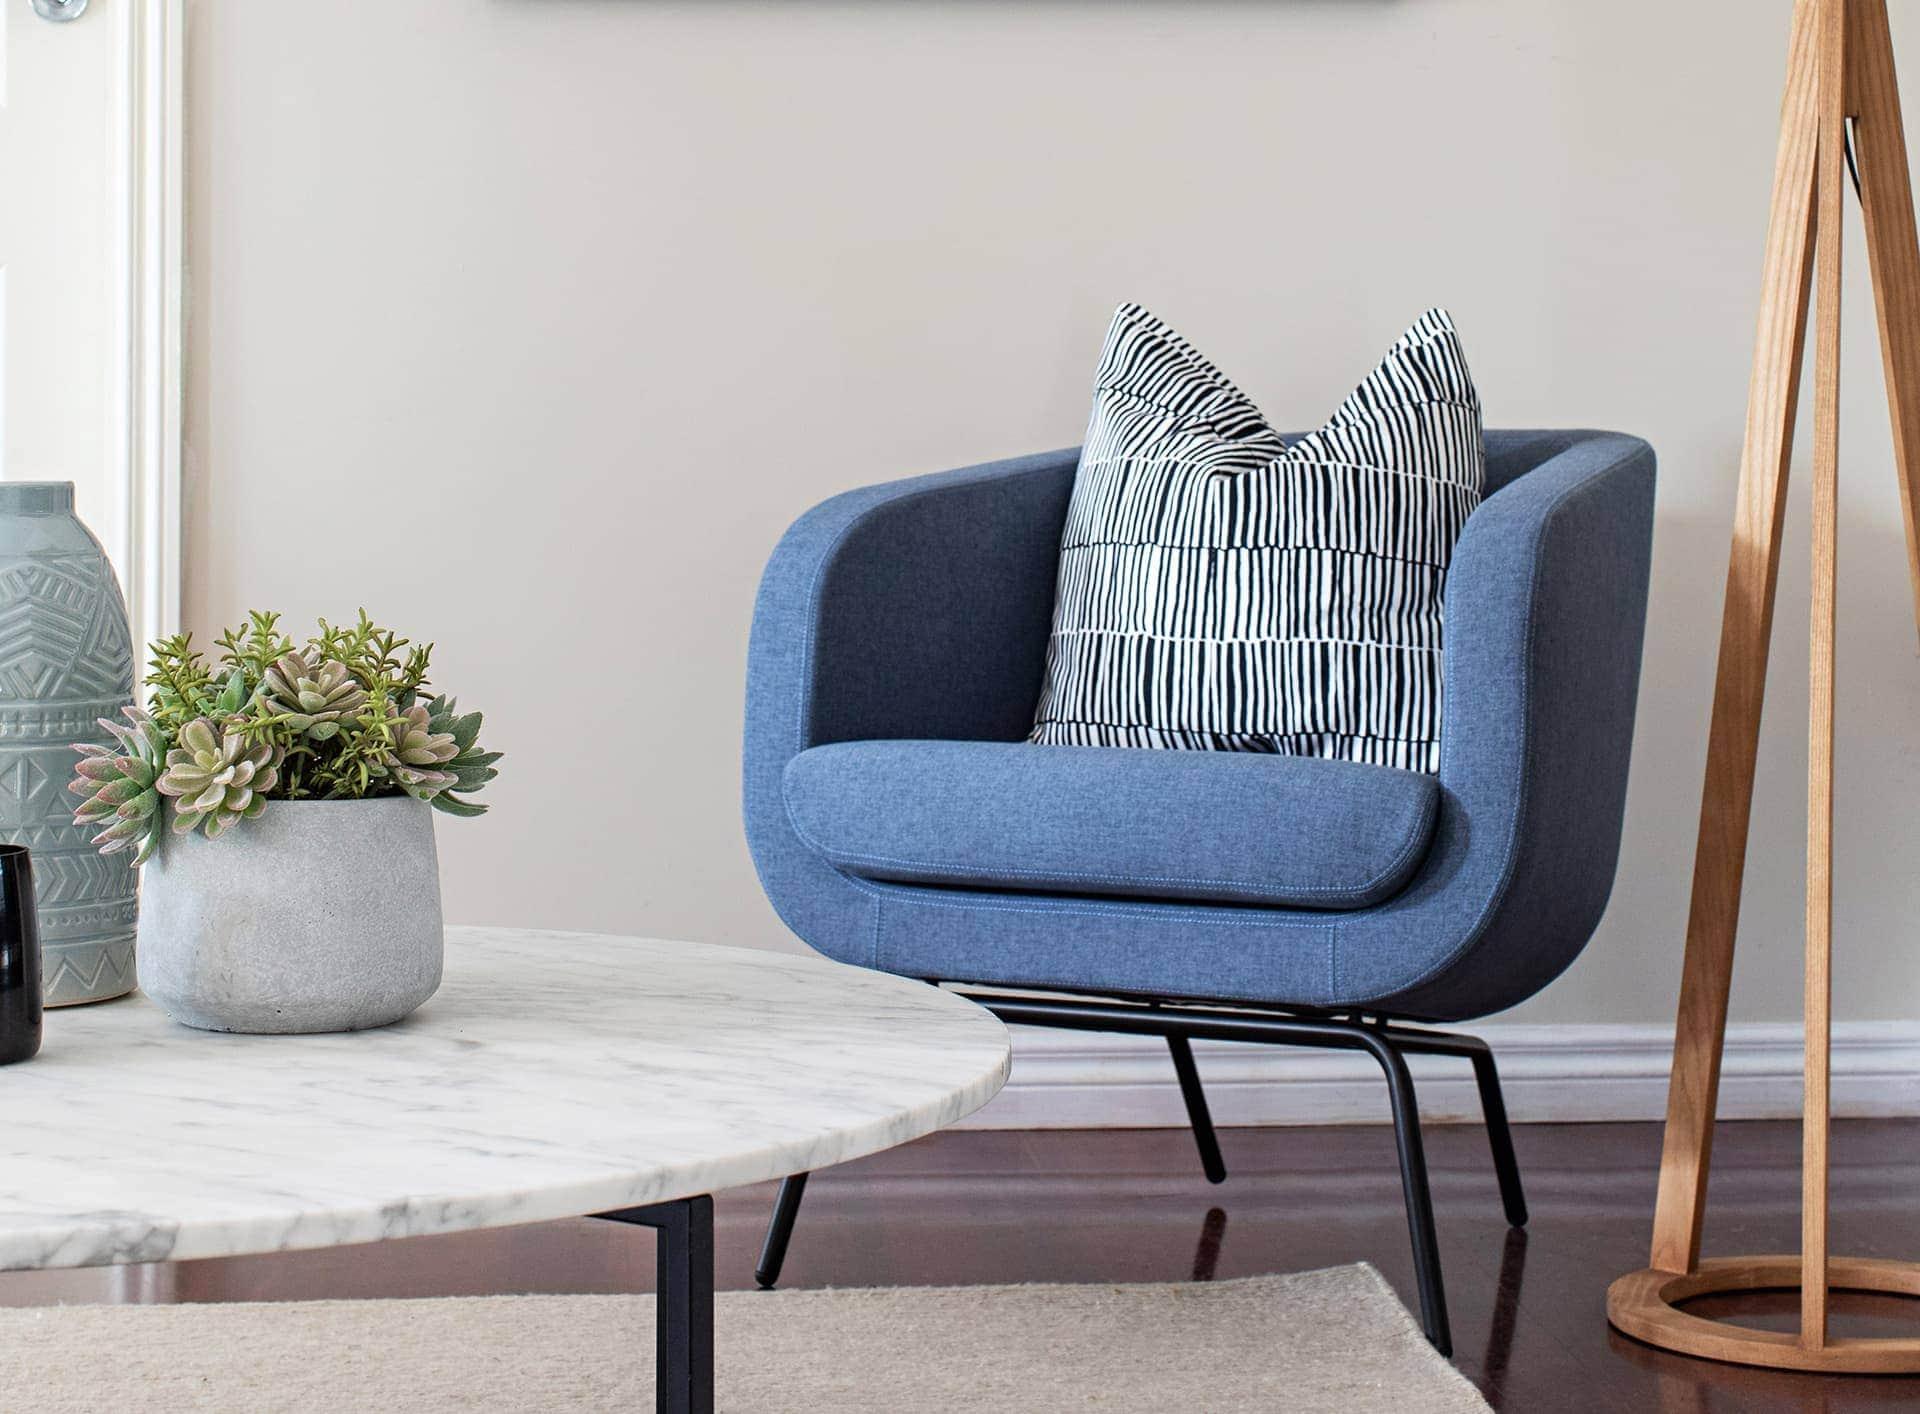 tlc interiors melbourne interior designers blue armchair from globewest